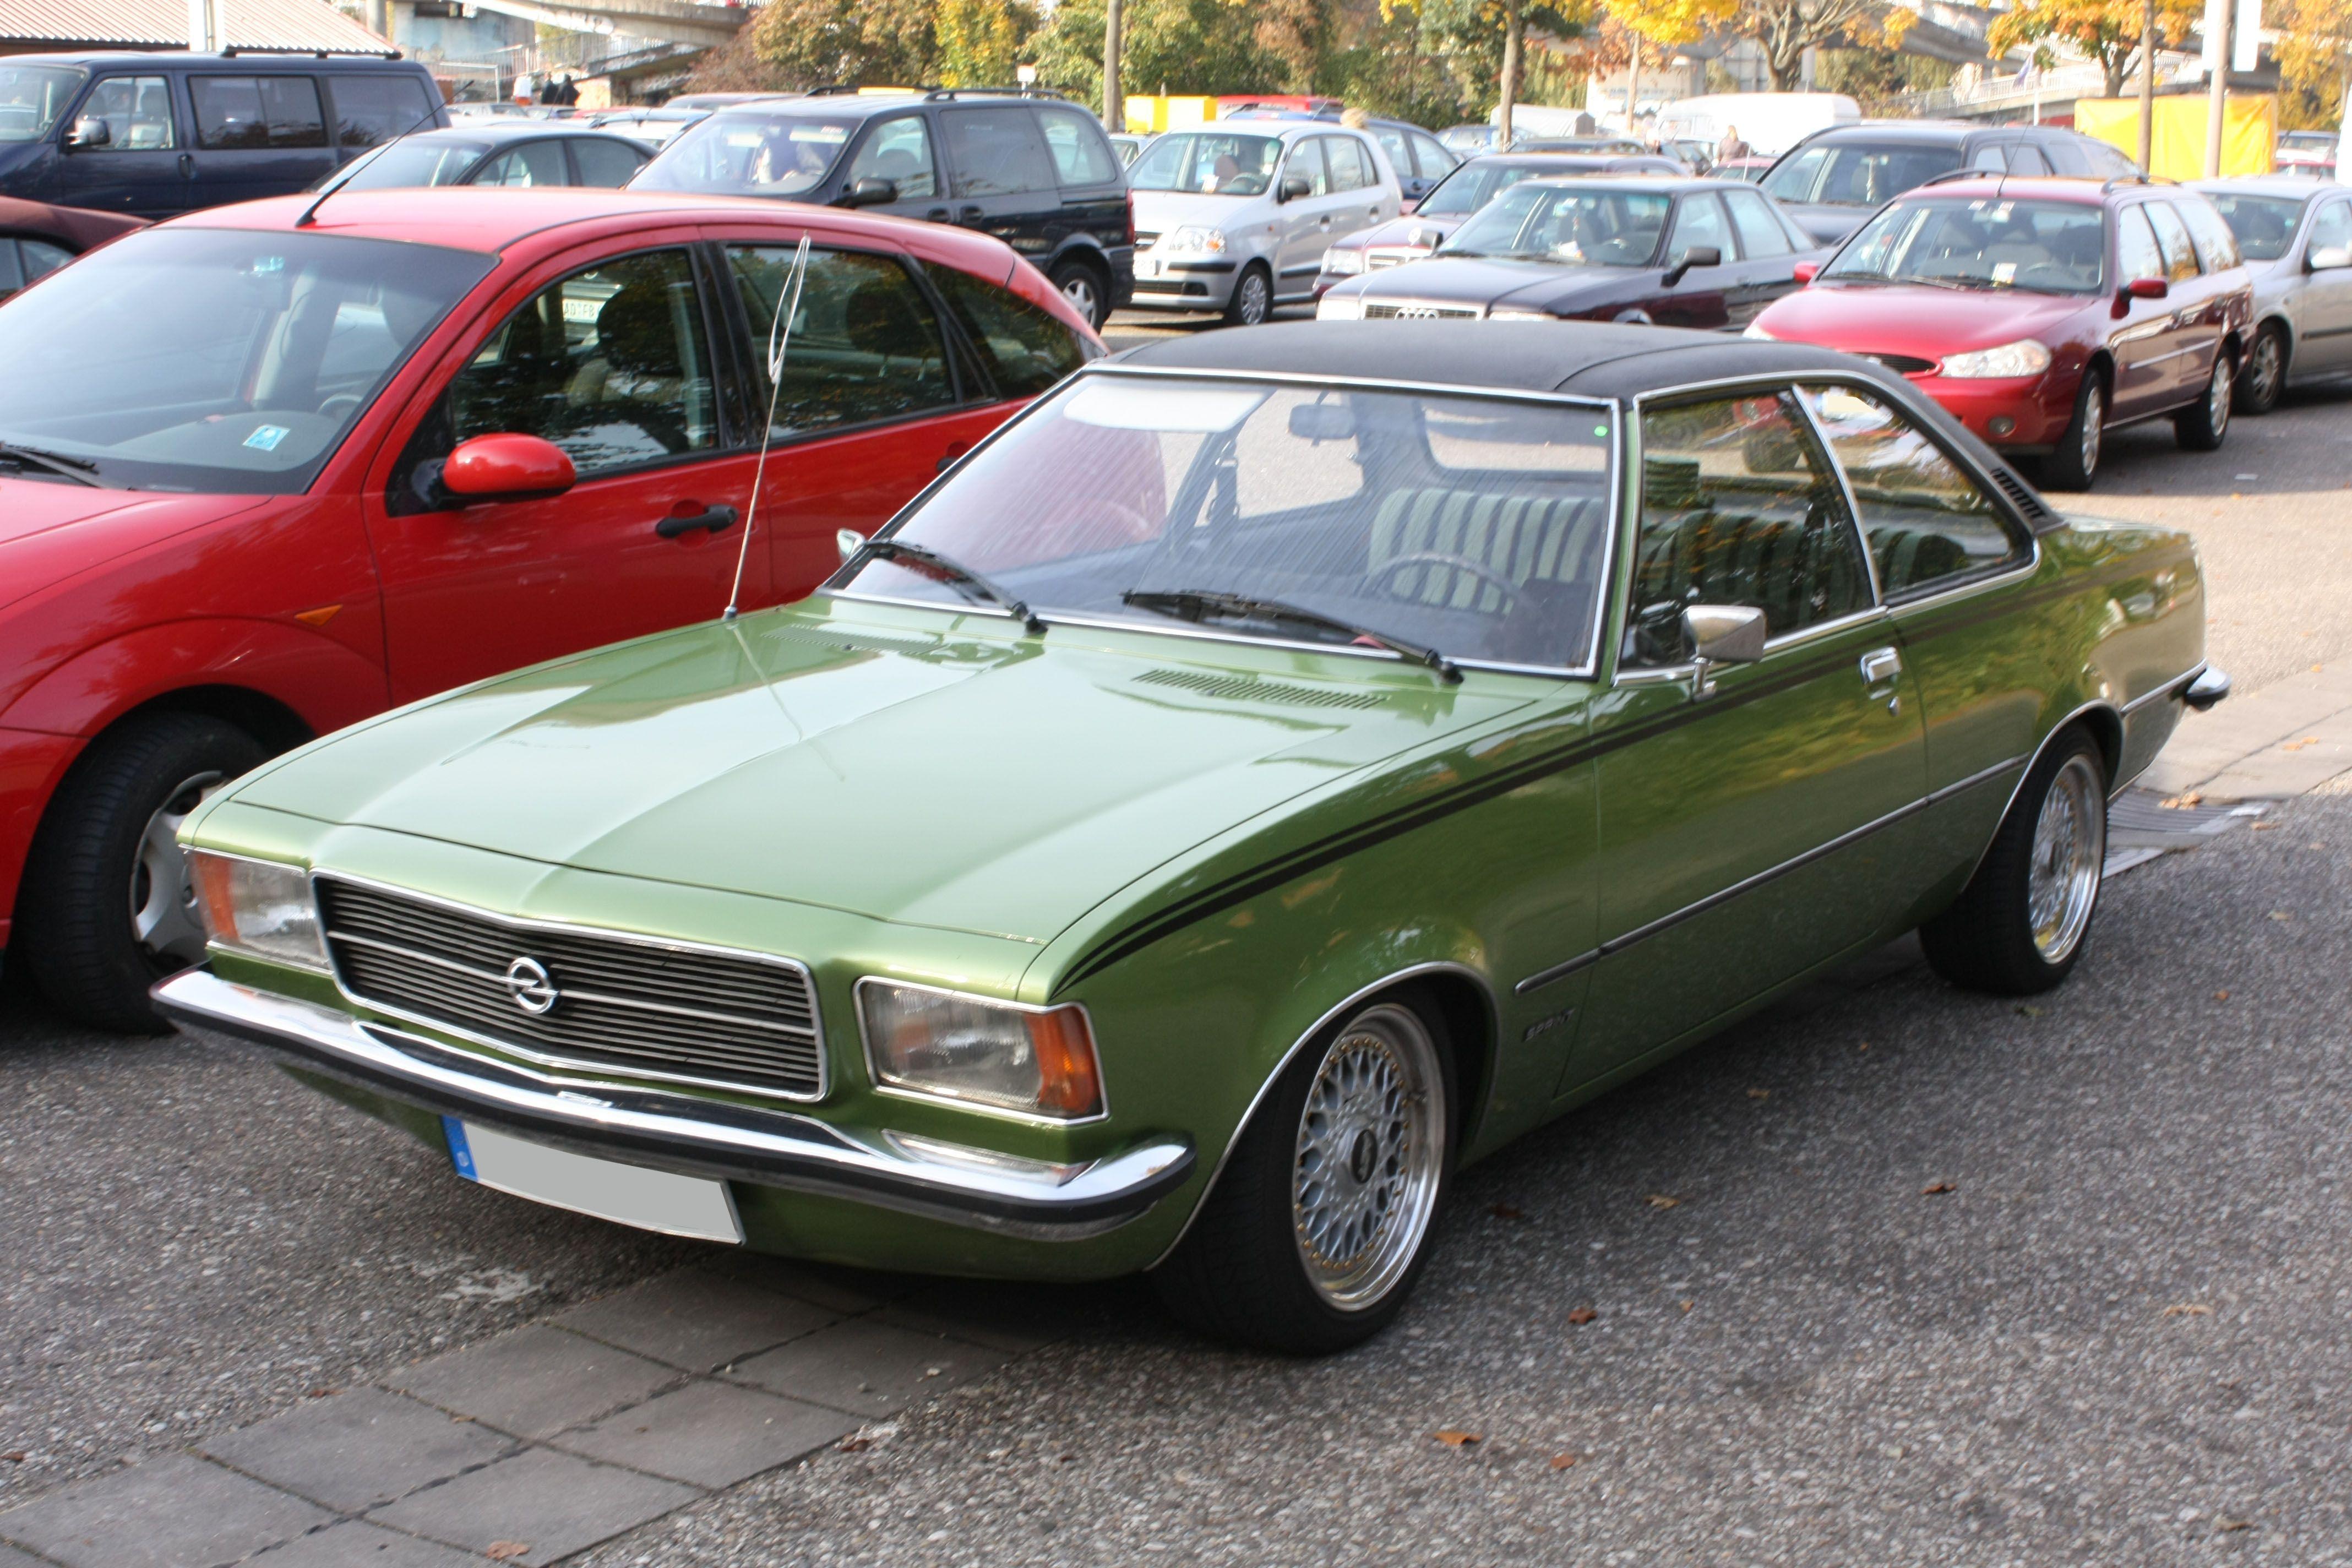 Rekord d | Opel | Pinterest | Supercar and Cars